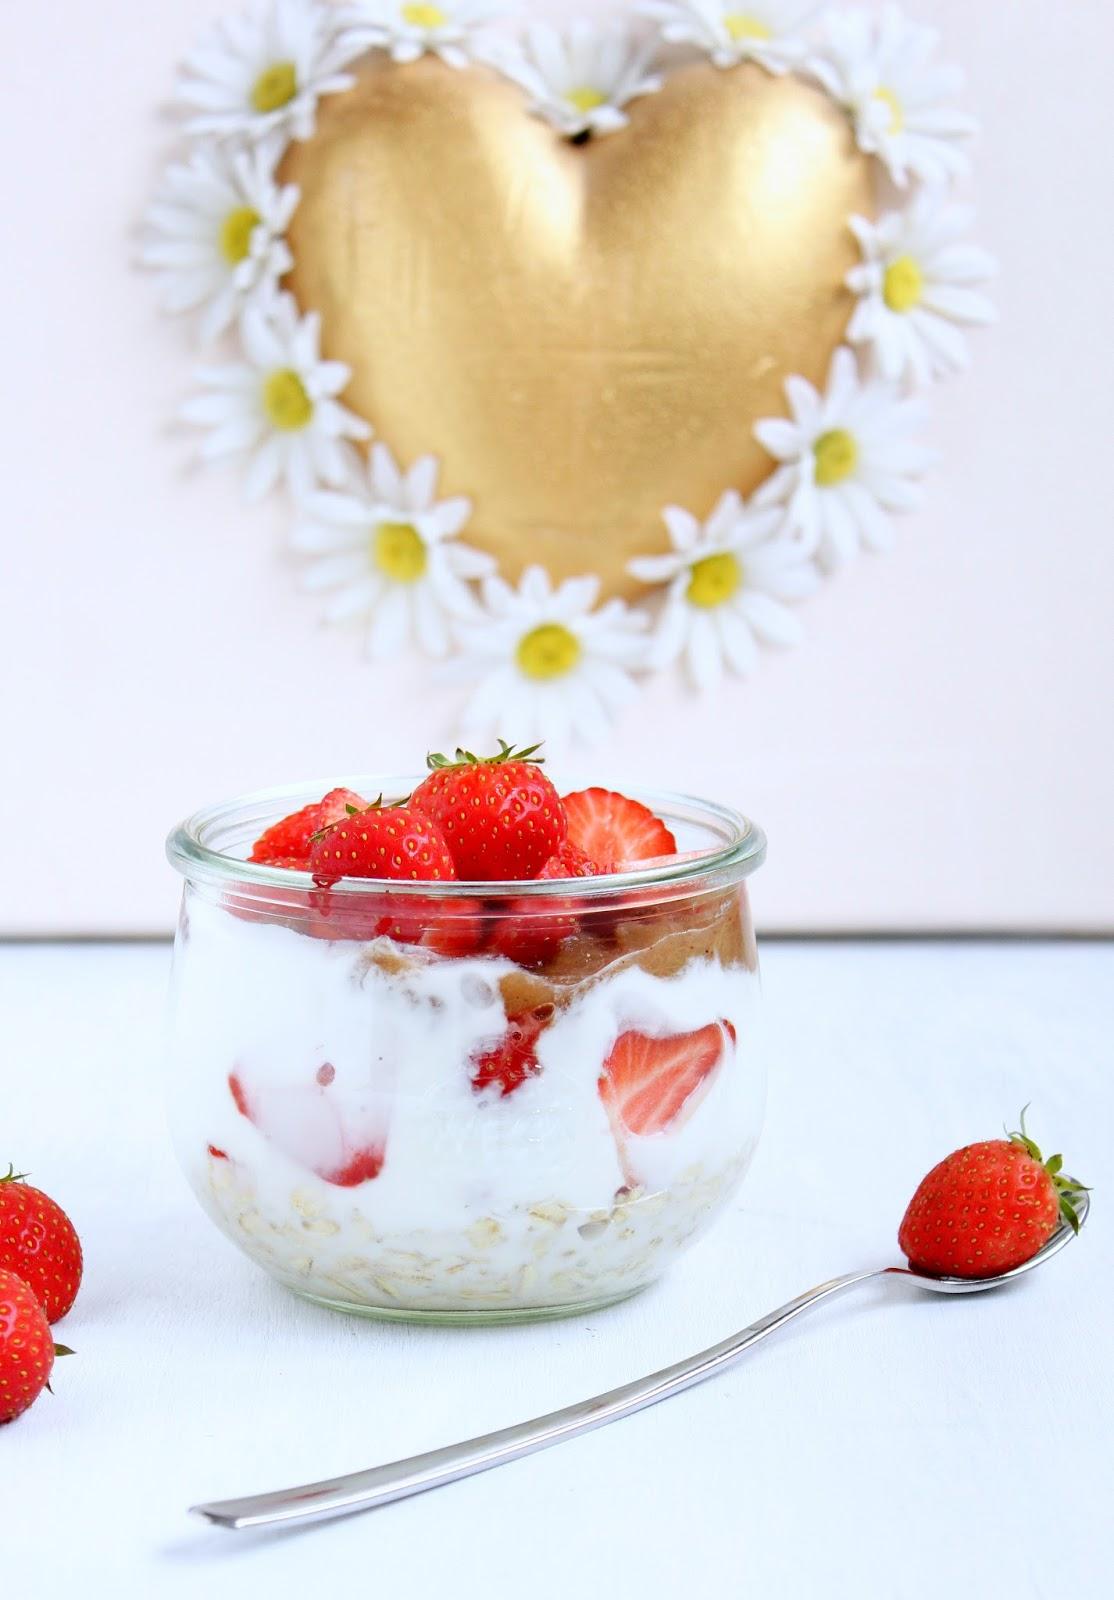 Erdbeer Rhabarber Overnight Oats